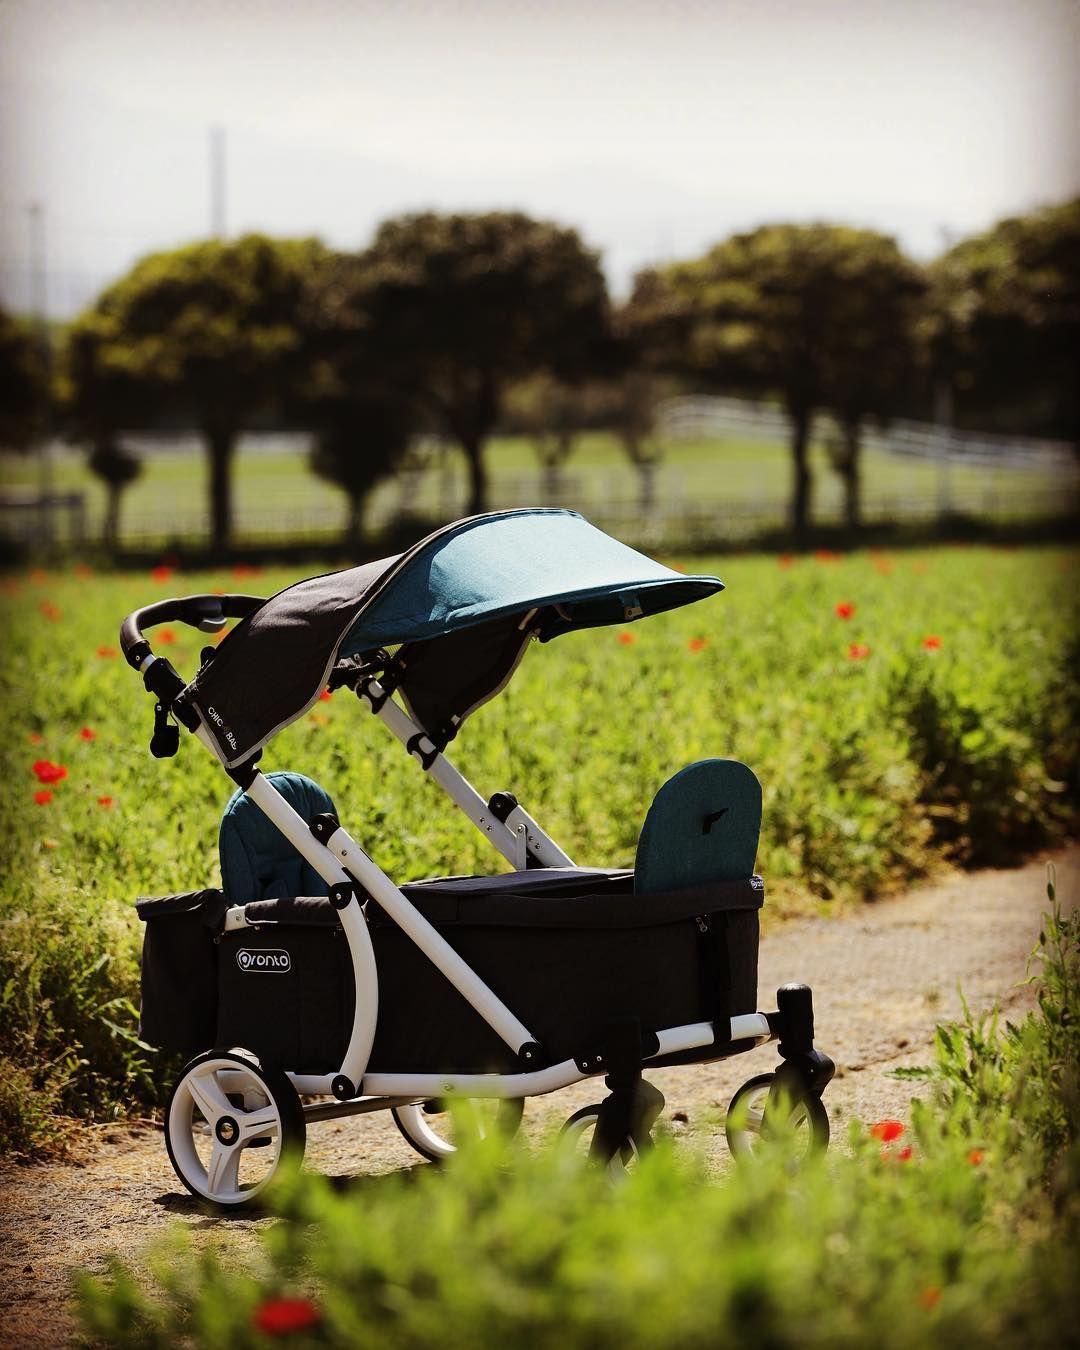 Pronto Stroller Wagon Uk - Stroller